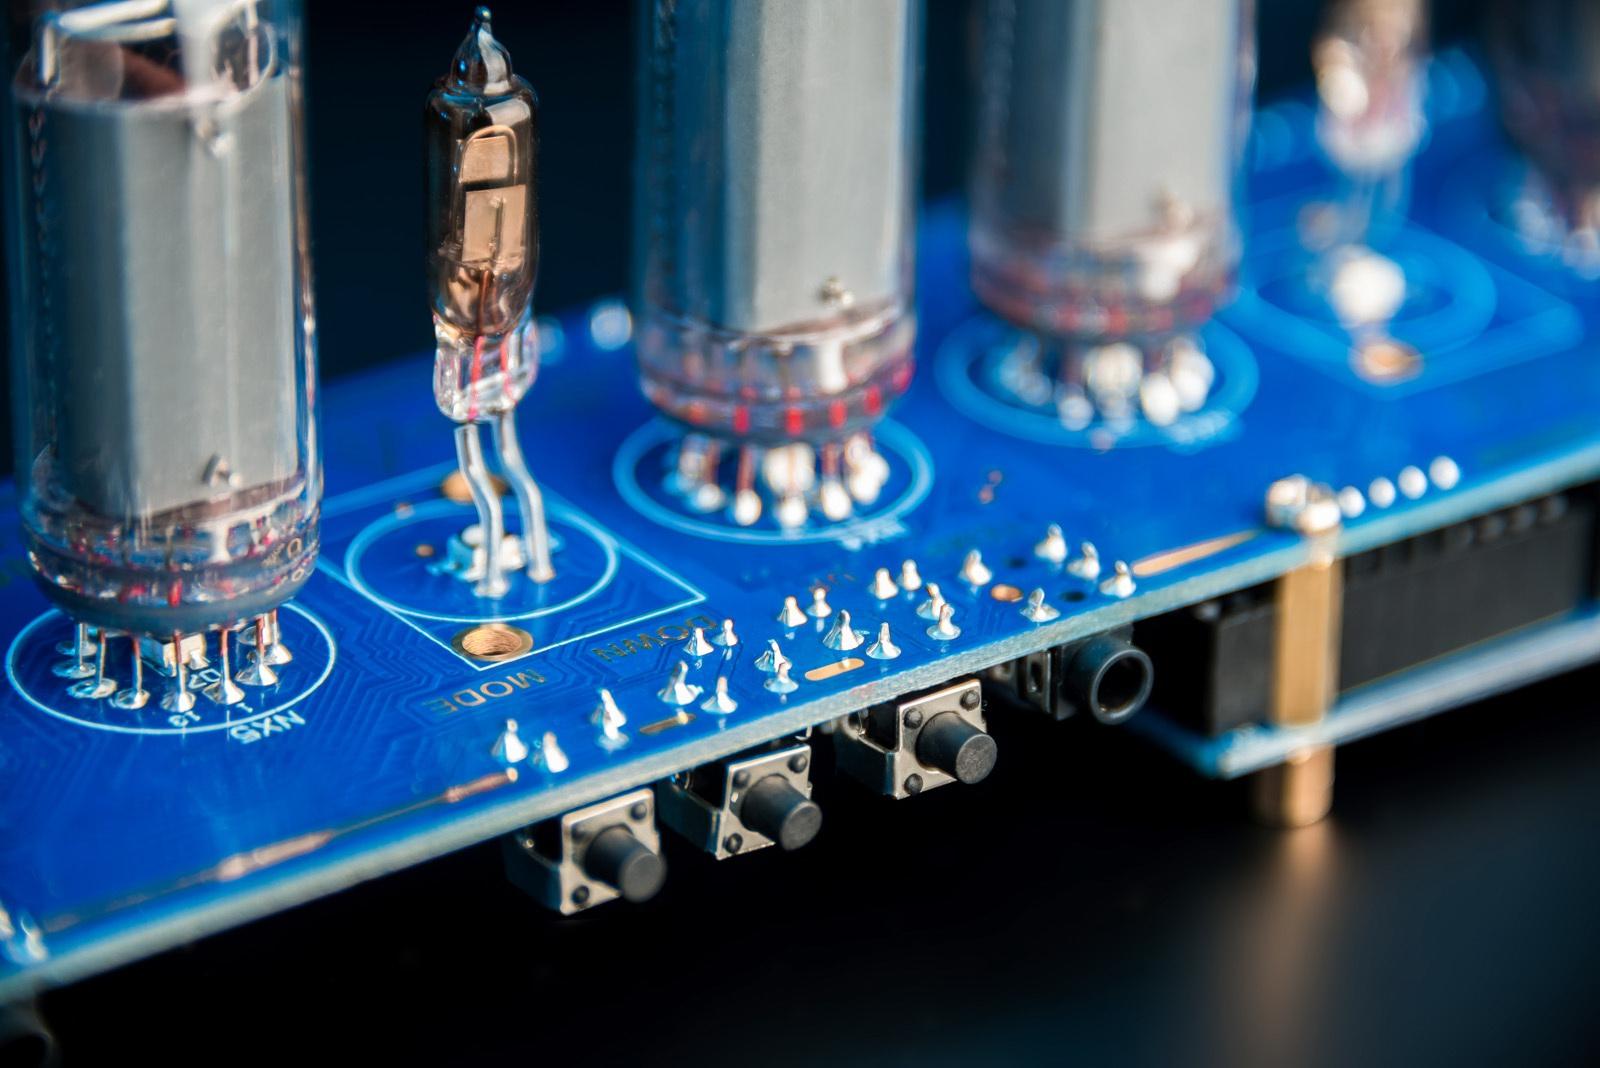 DIY KIT for Arduino Shield NCS314 IN-14 Nixie Tubes Clock